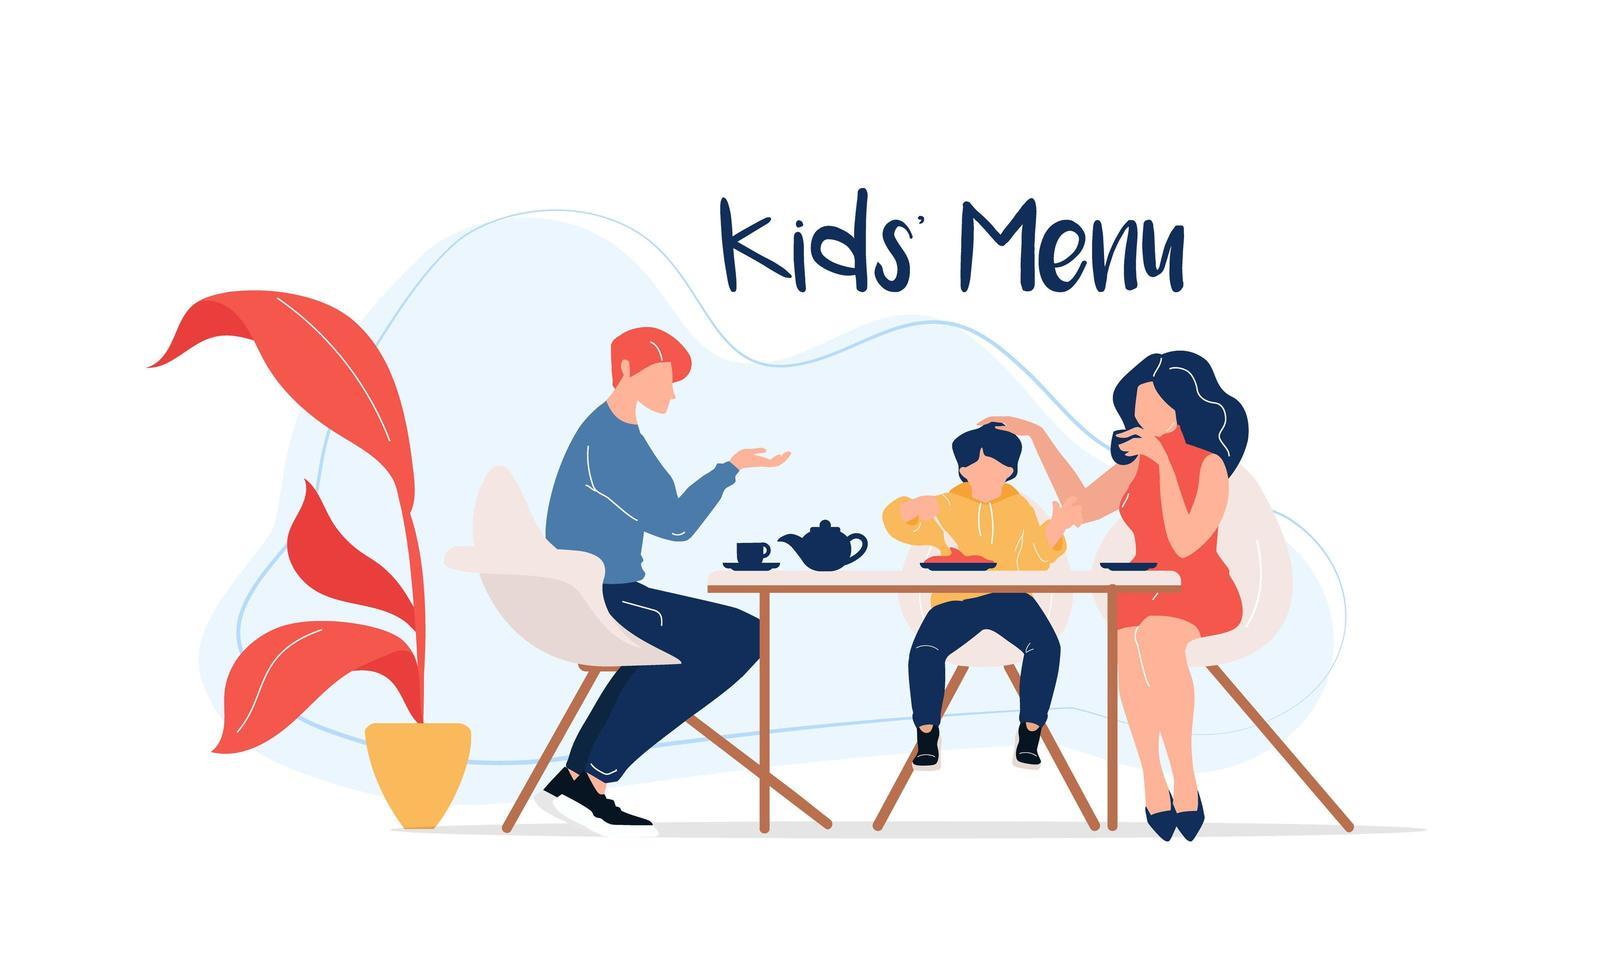 Kindermenü am Tisch vektor